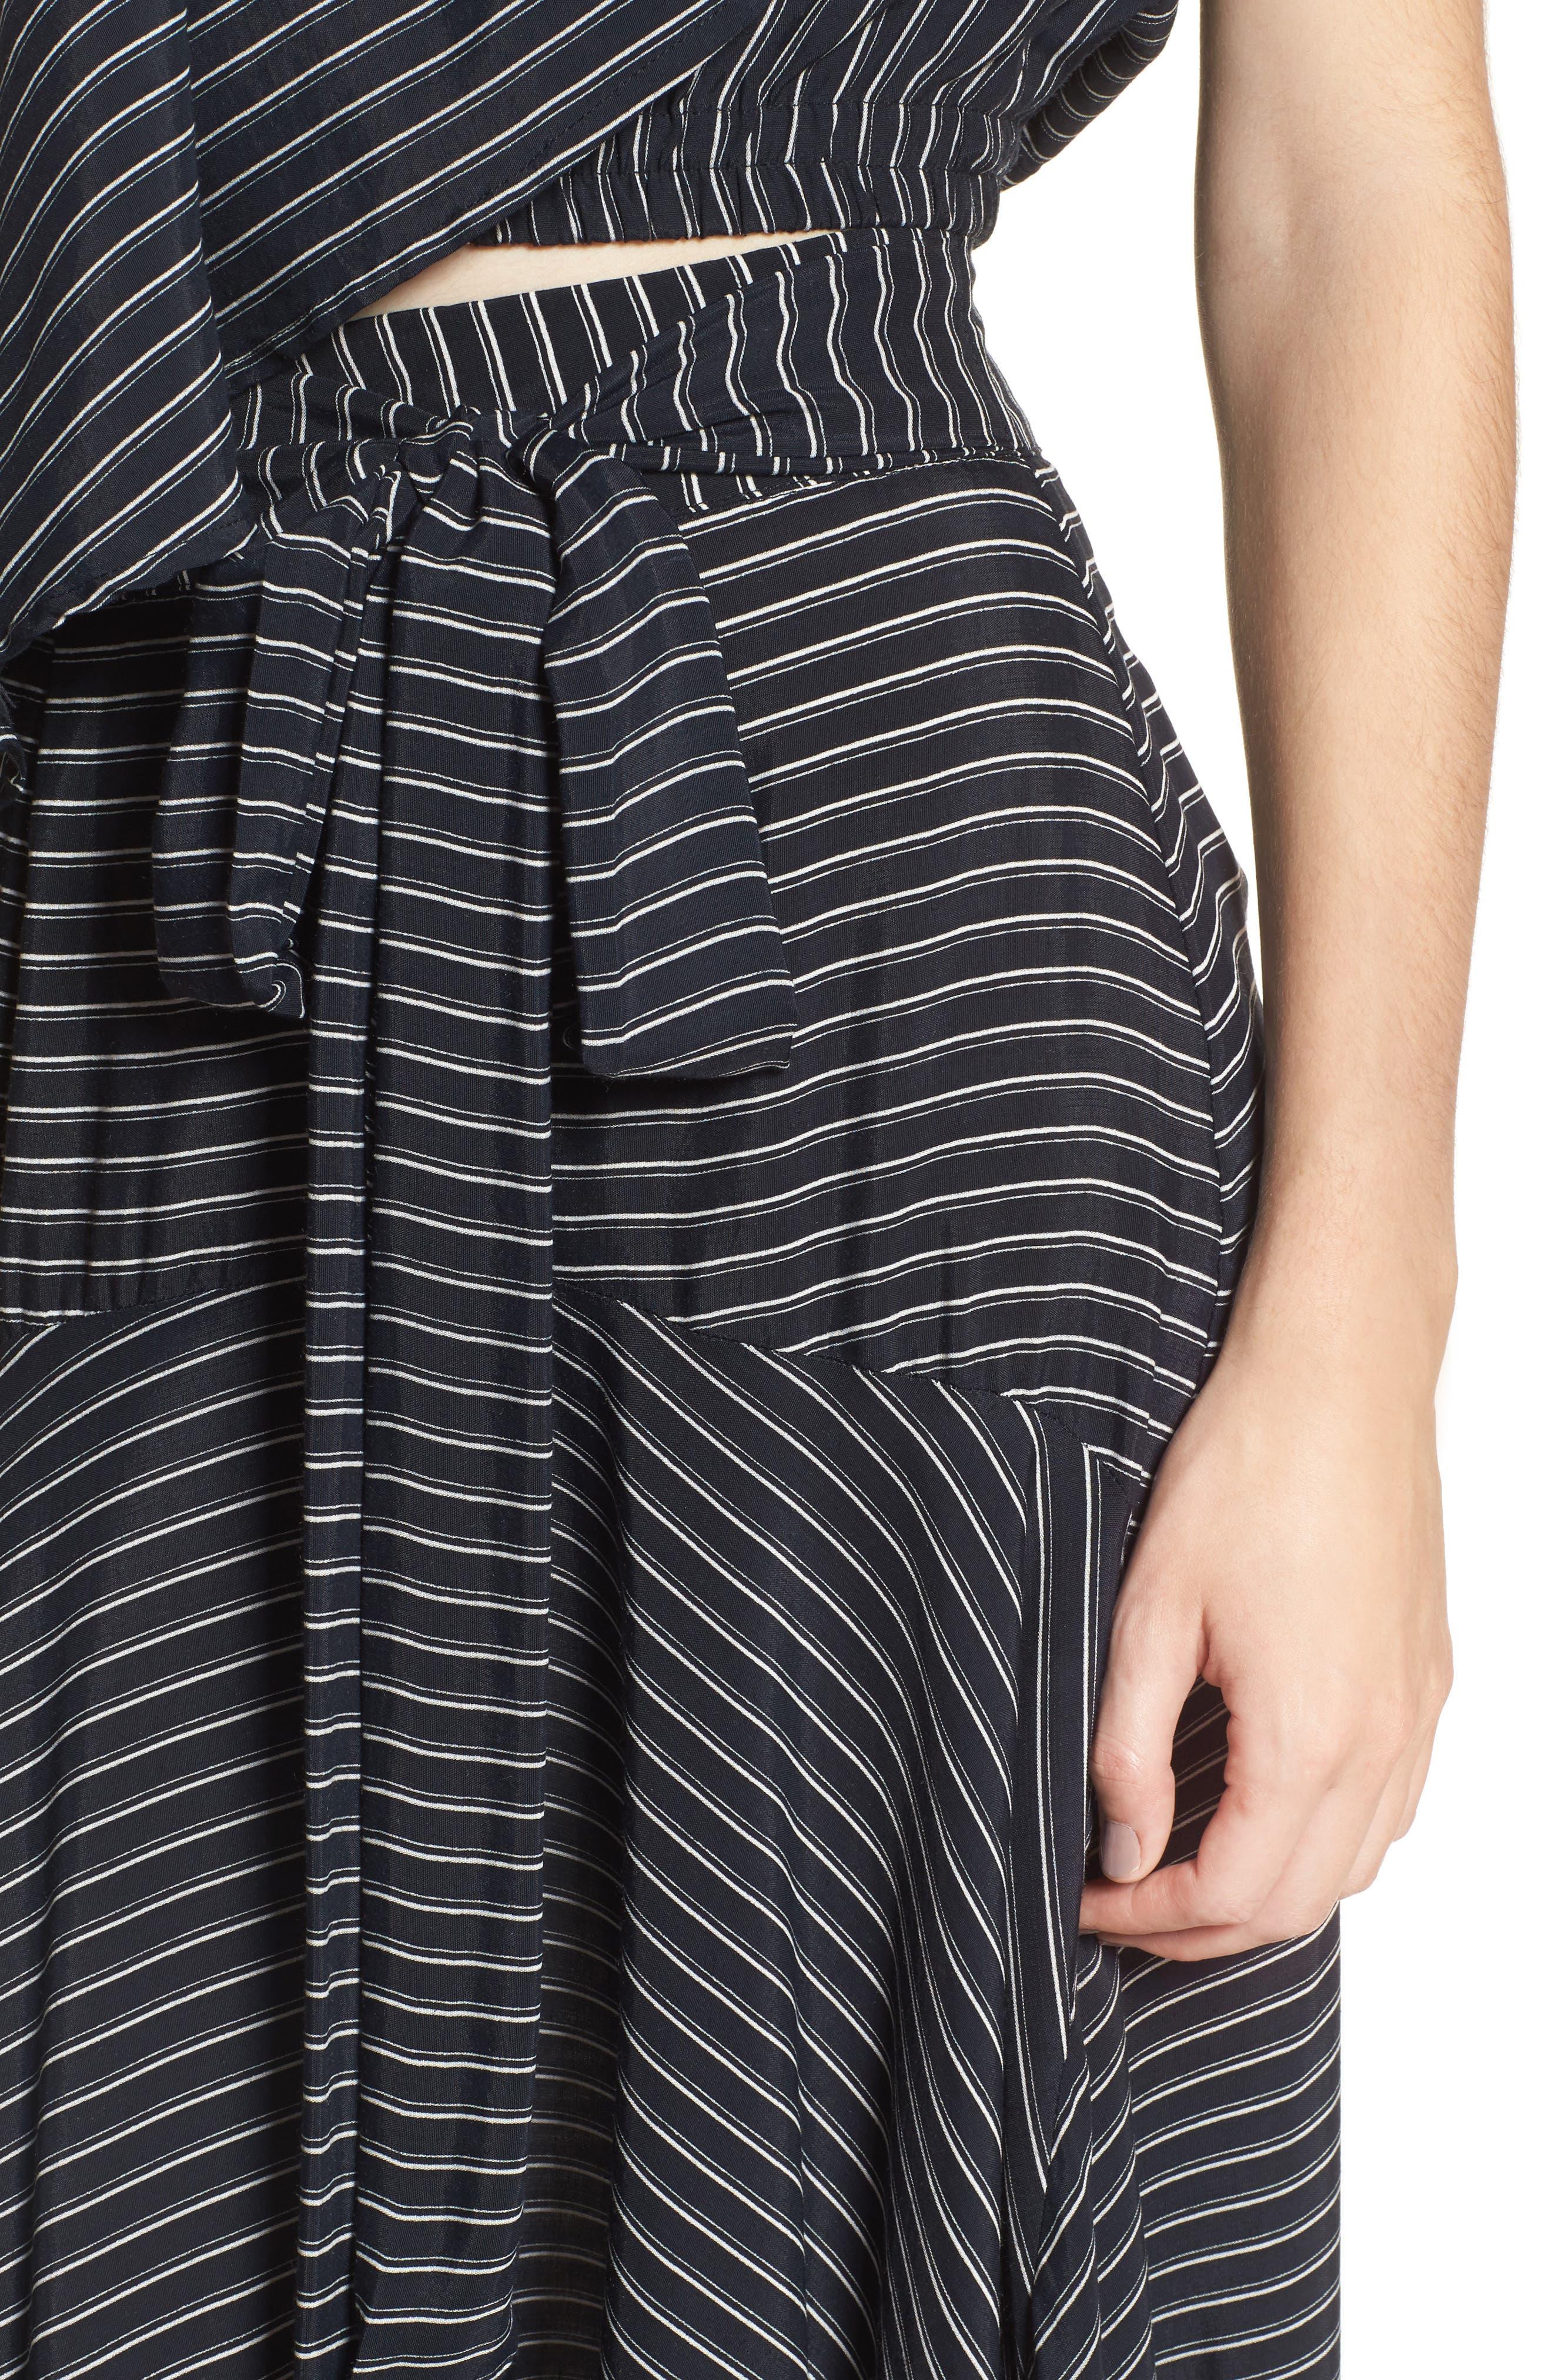 Kamares Ruffle Midi Skirt,                             Alternate thumbnail 4, color,                             001